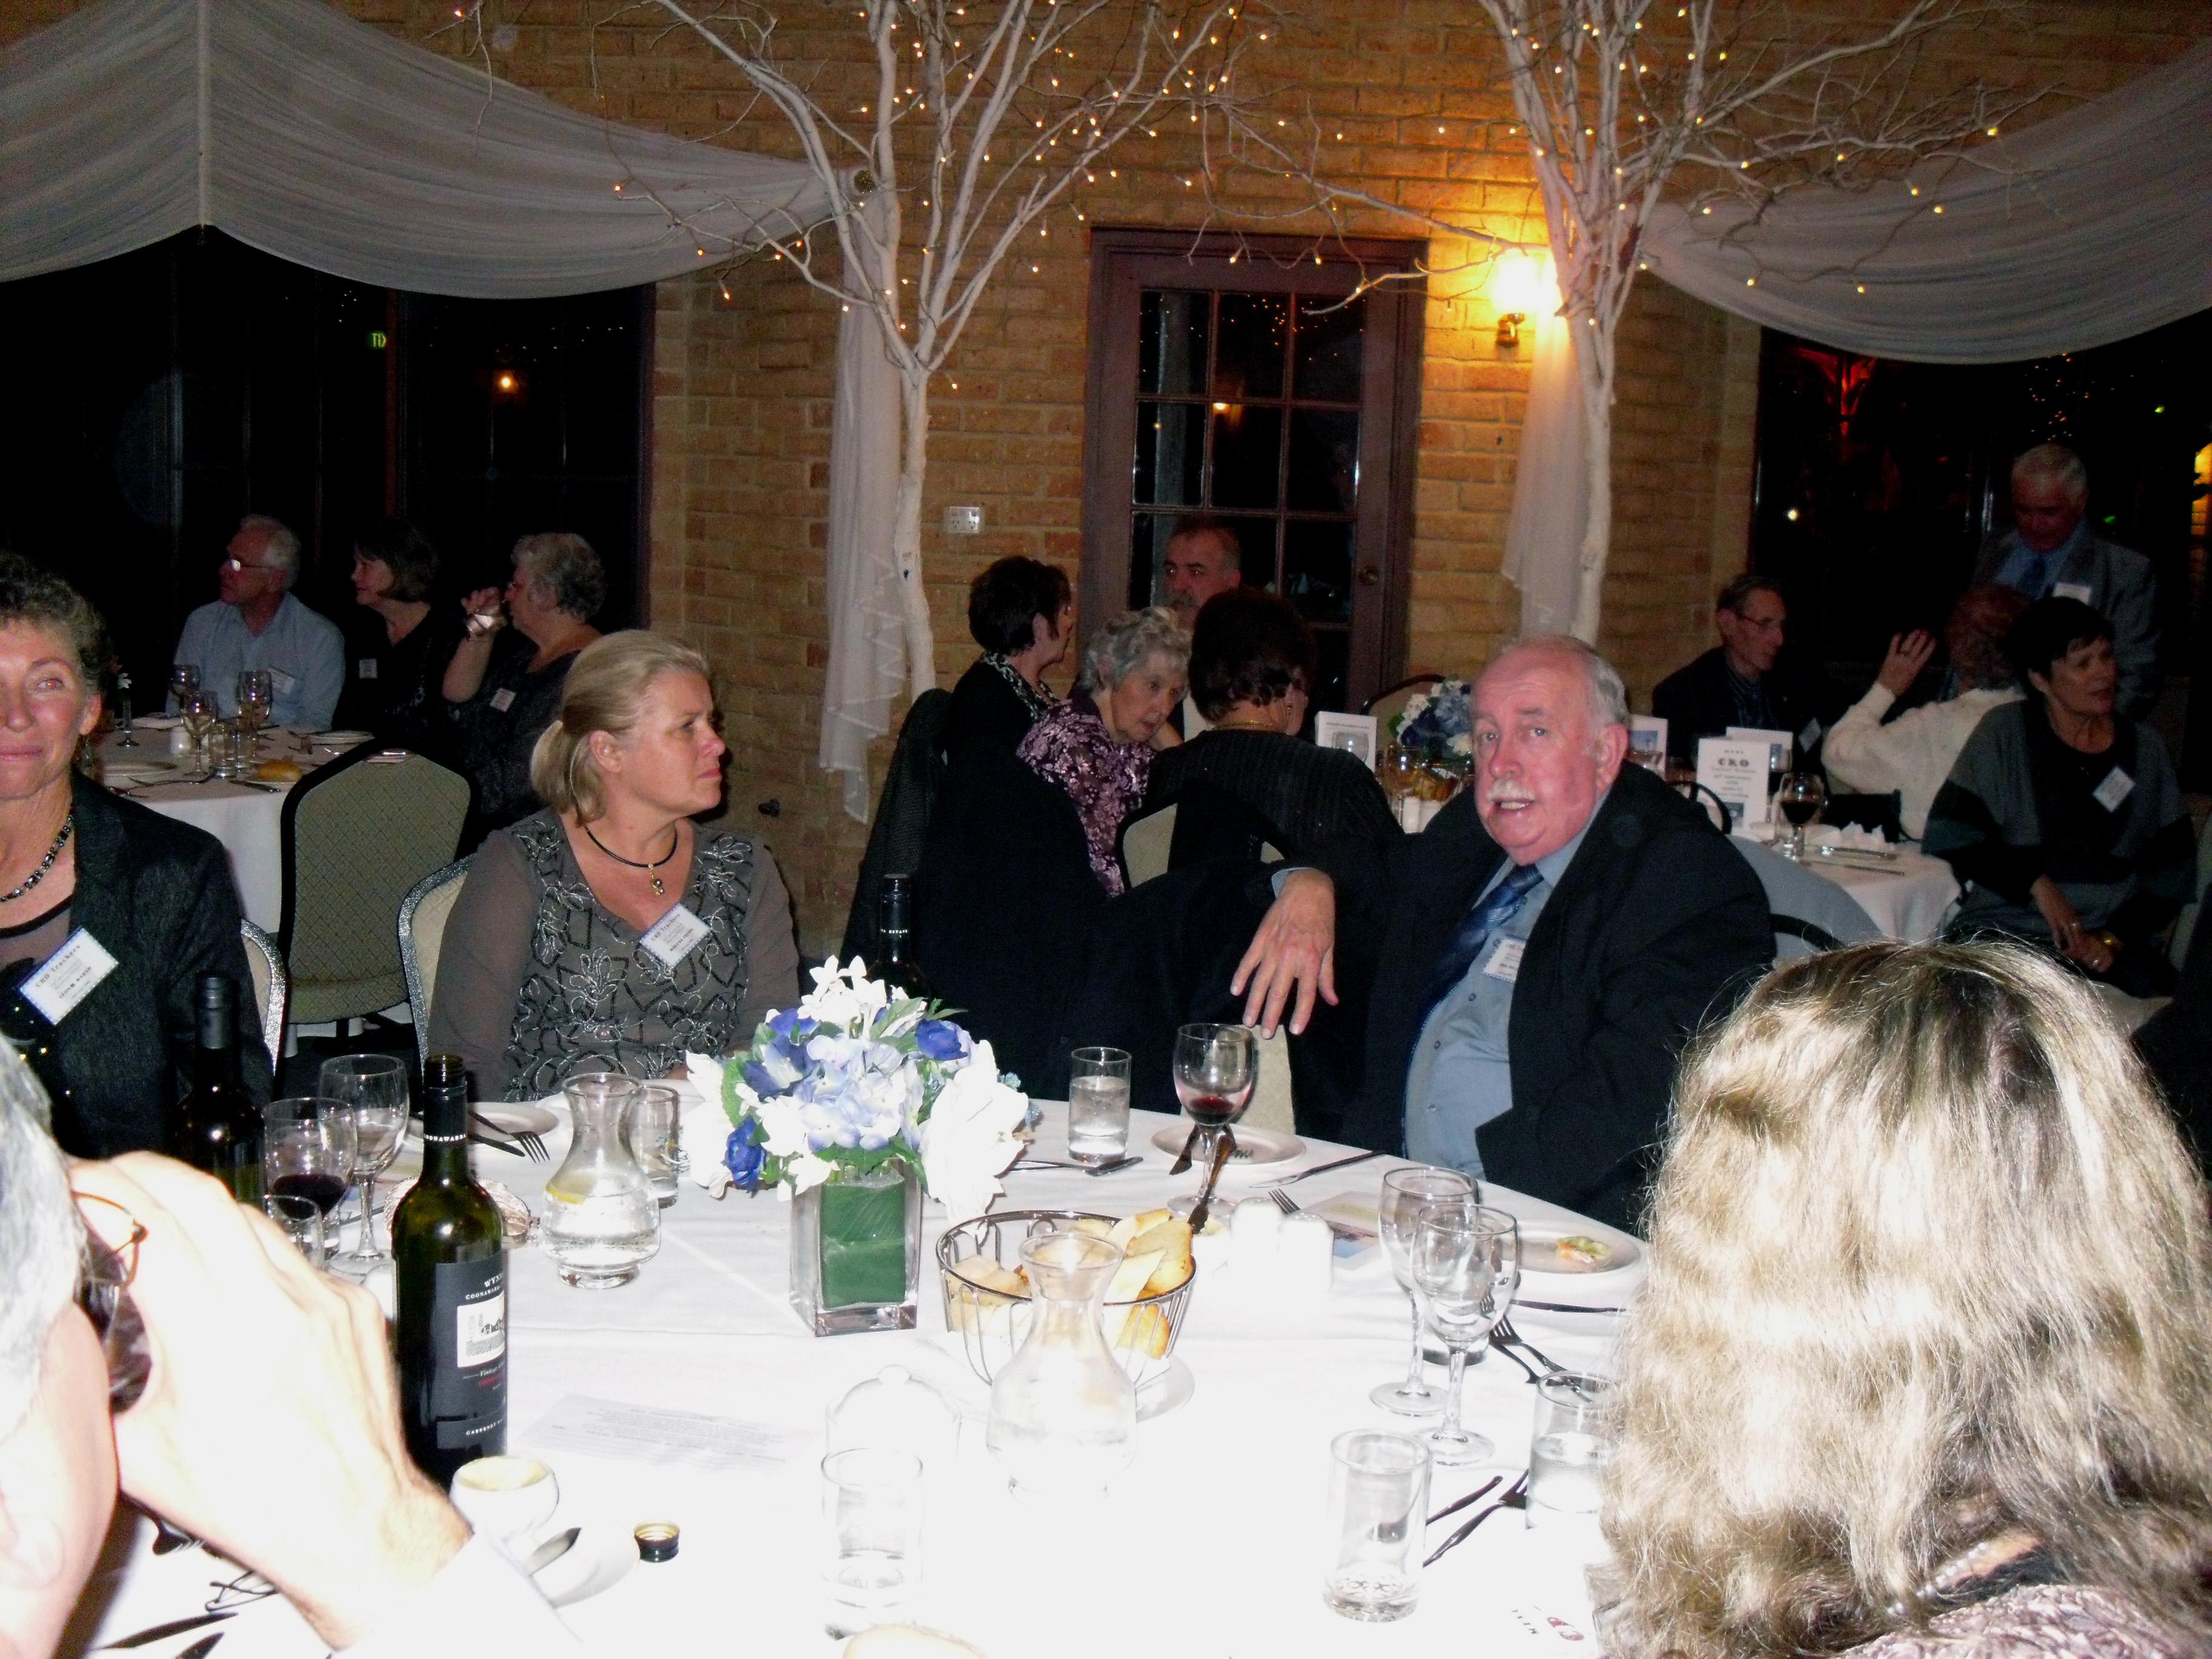 Marieka Squire and John Preece